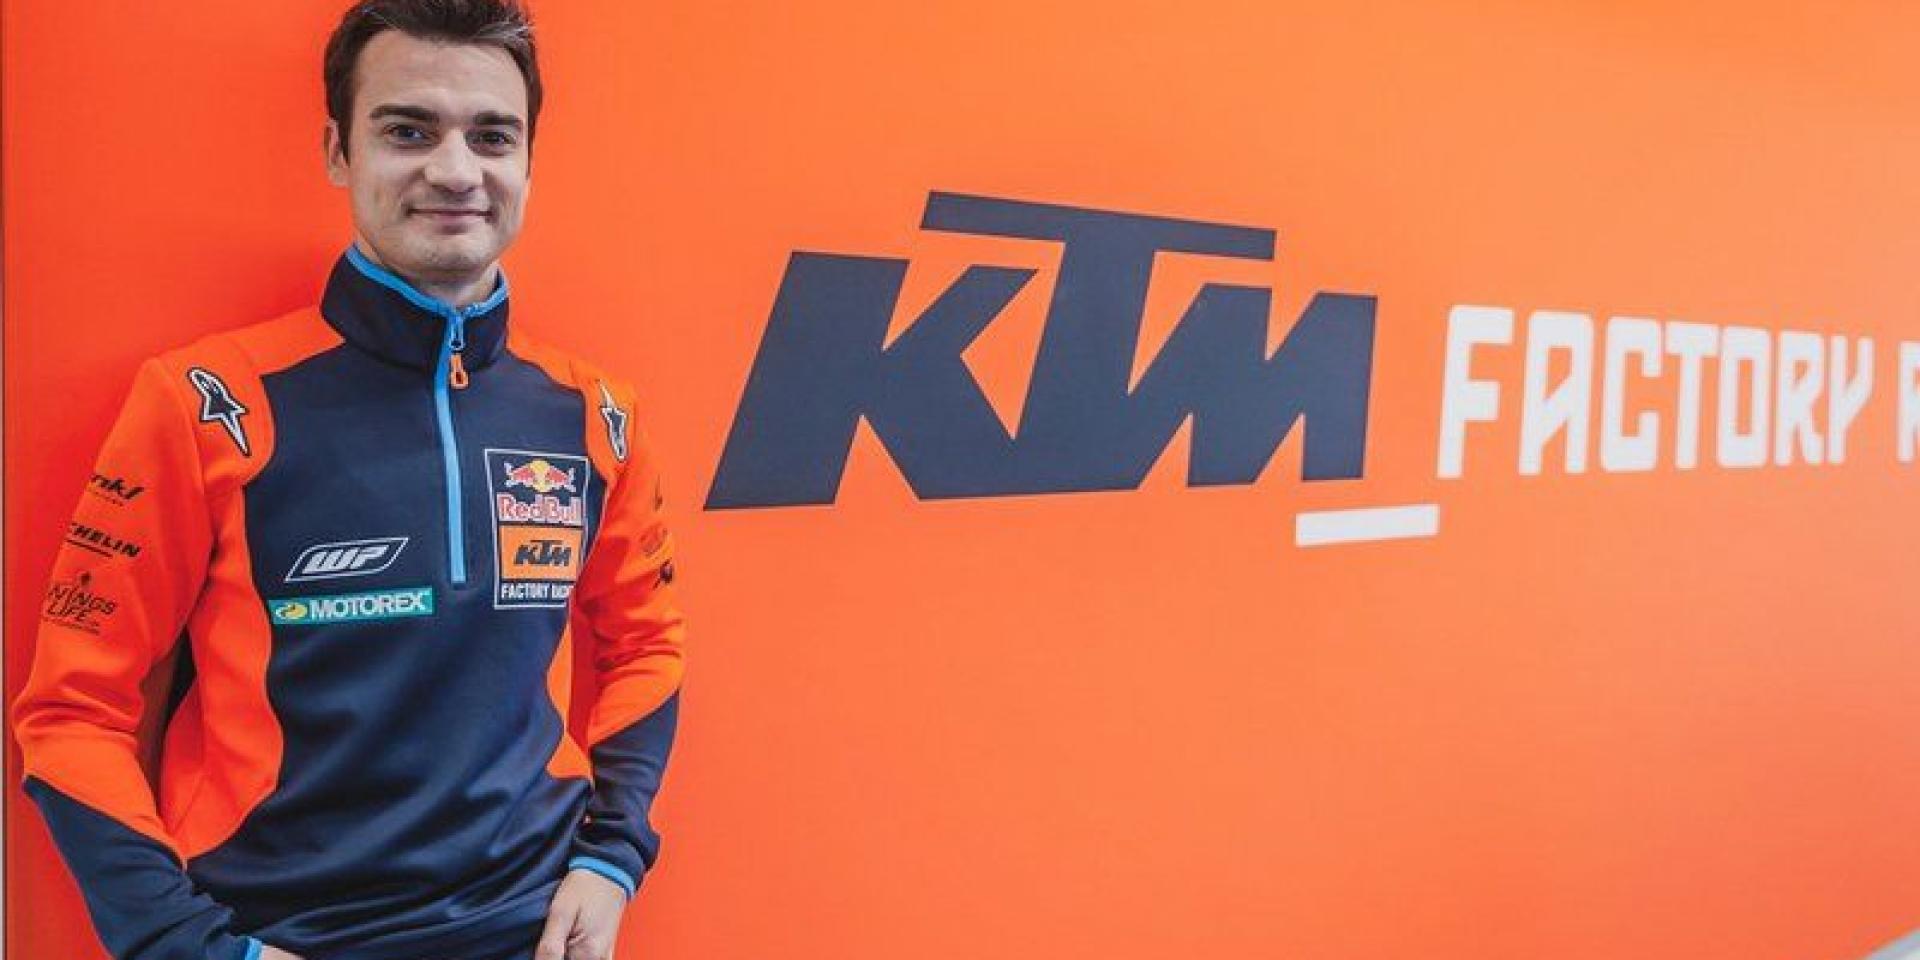 合約搞定!Dani Pedrosa與Mika Kallio續留KTM測試車手職!